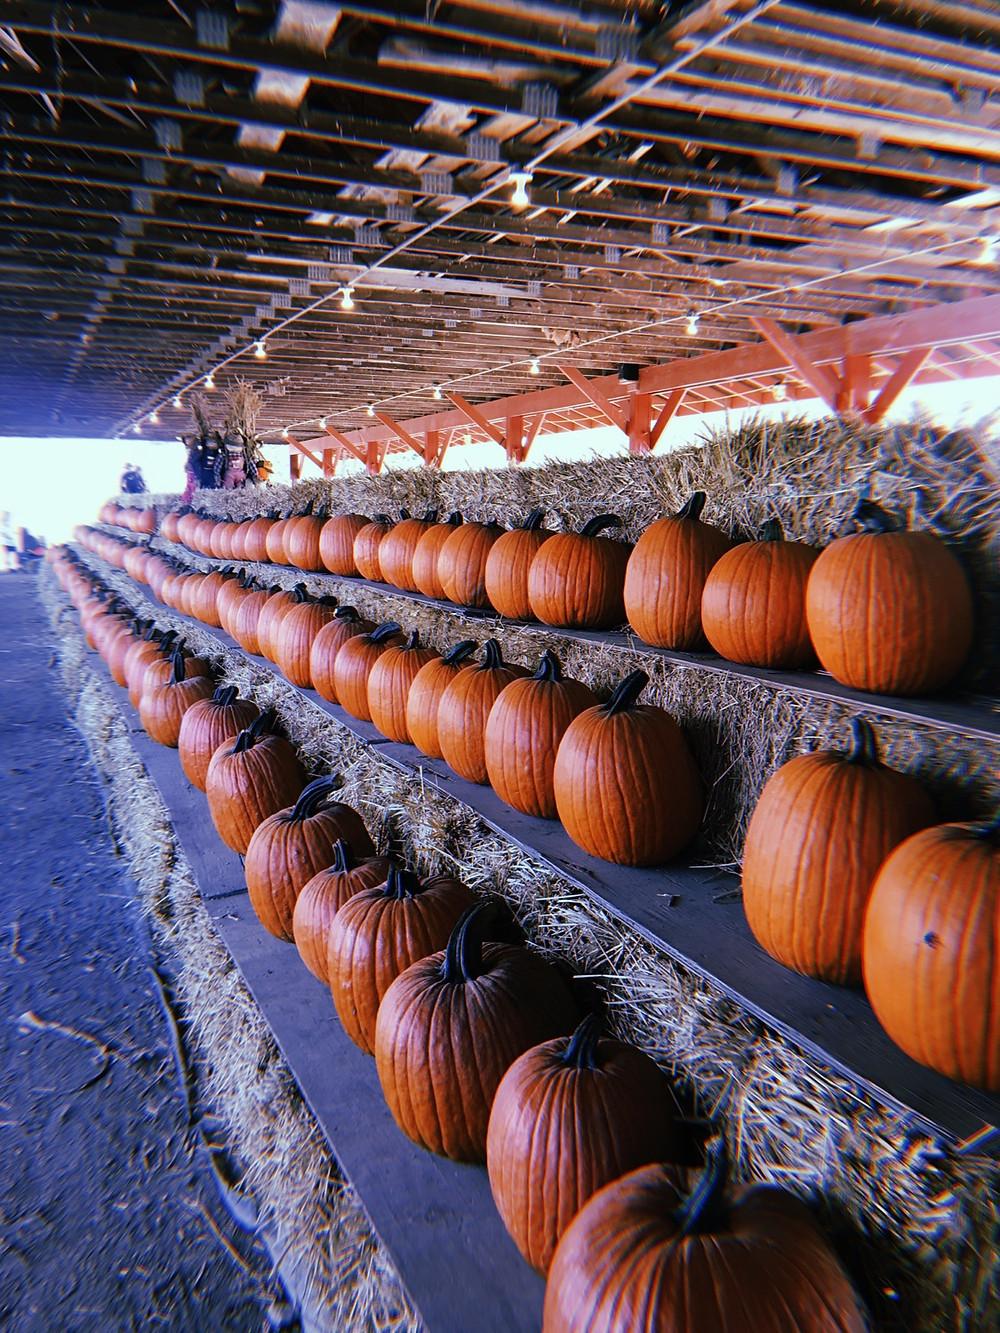 Pumpkins at Wallkill View Farm Stand in New Paltz, NY